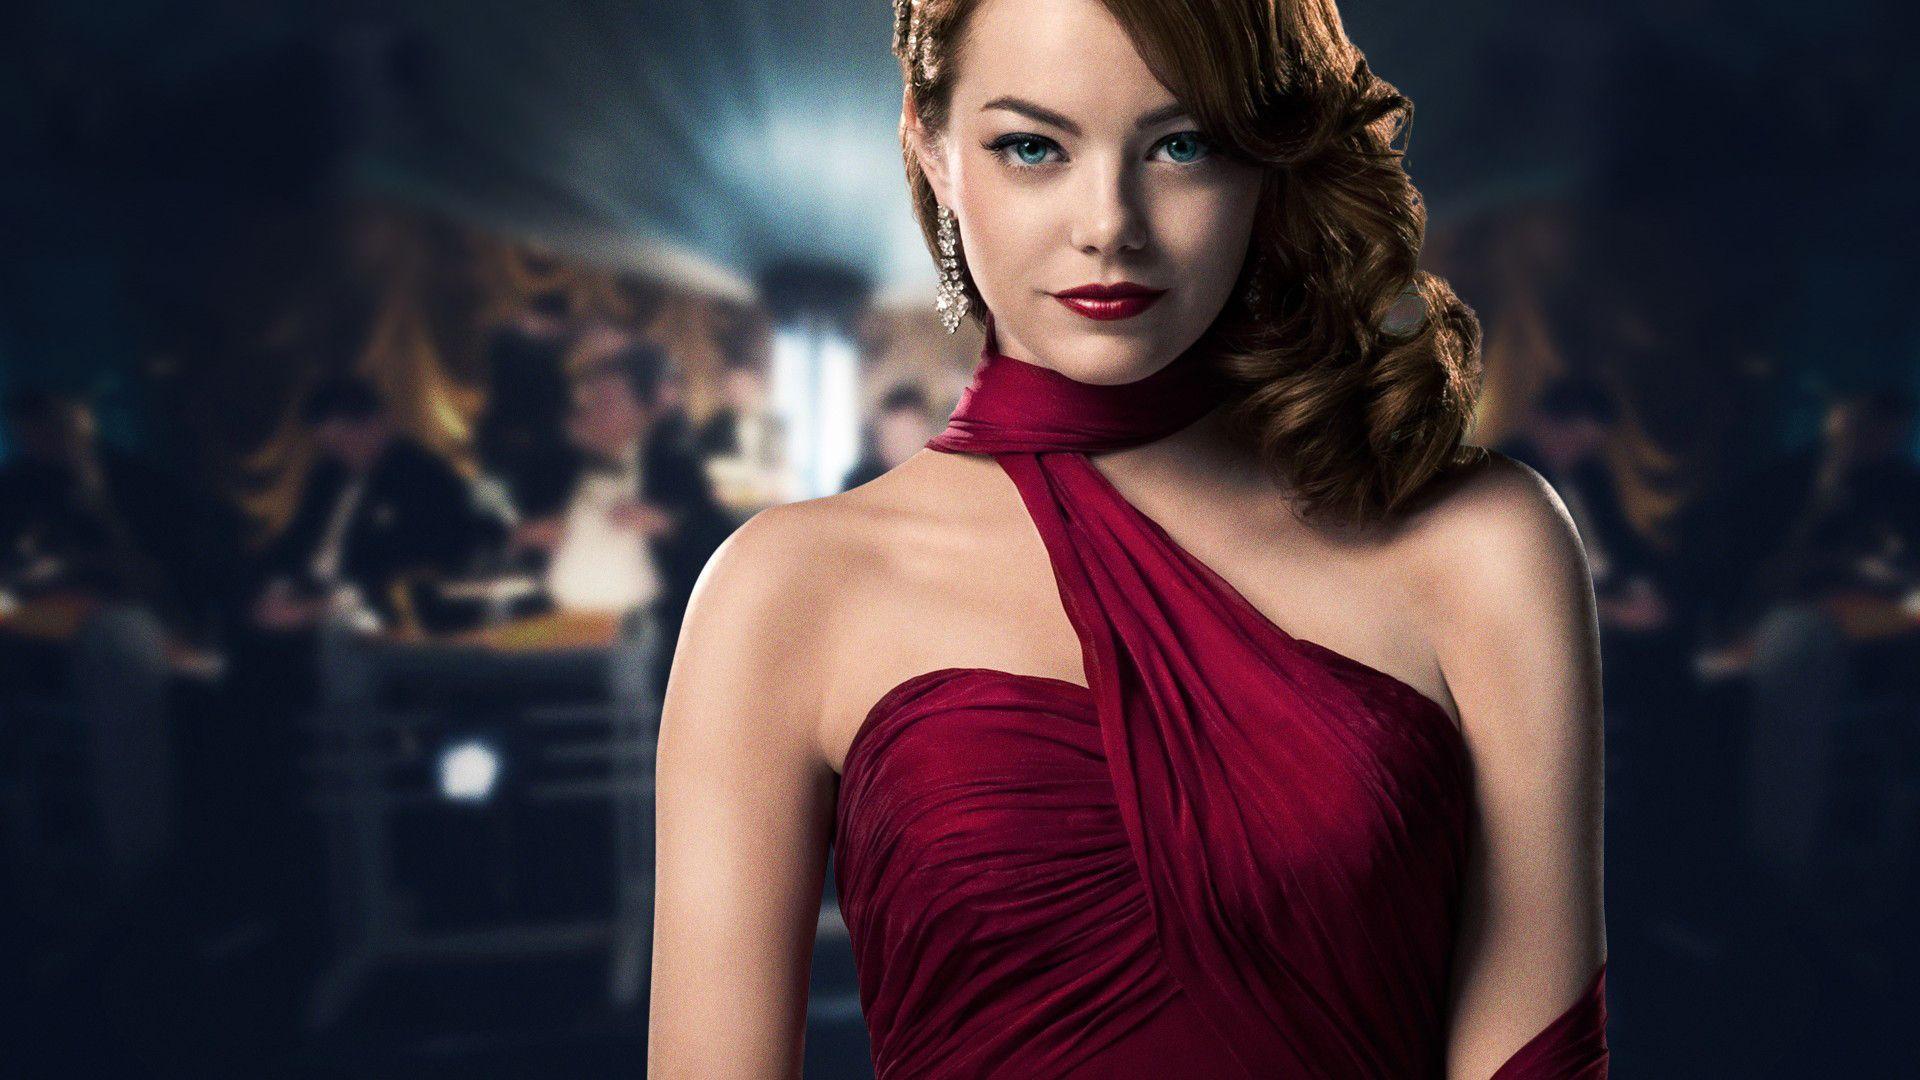 Emma Stone Wallpaper HD